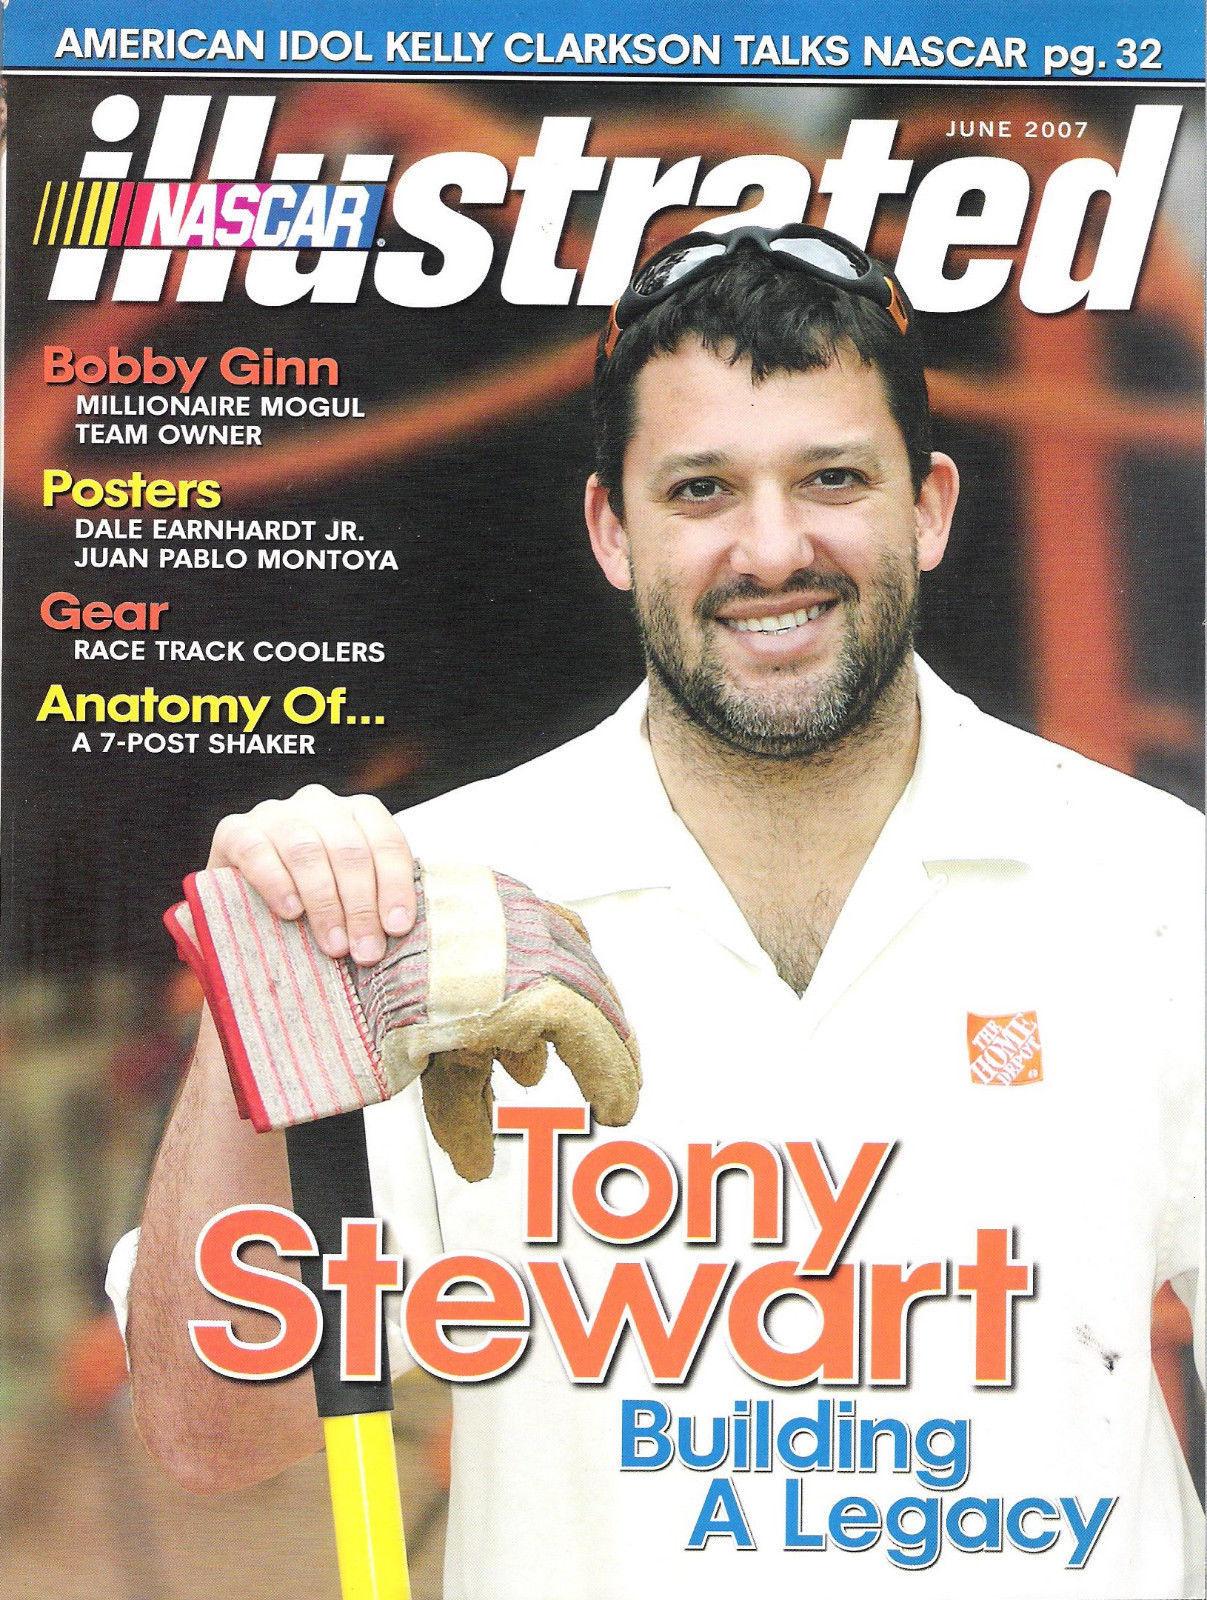 Nascar Illustrated June 2007 Tony Stewart Building A Legacy Montoya Poster